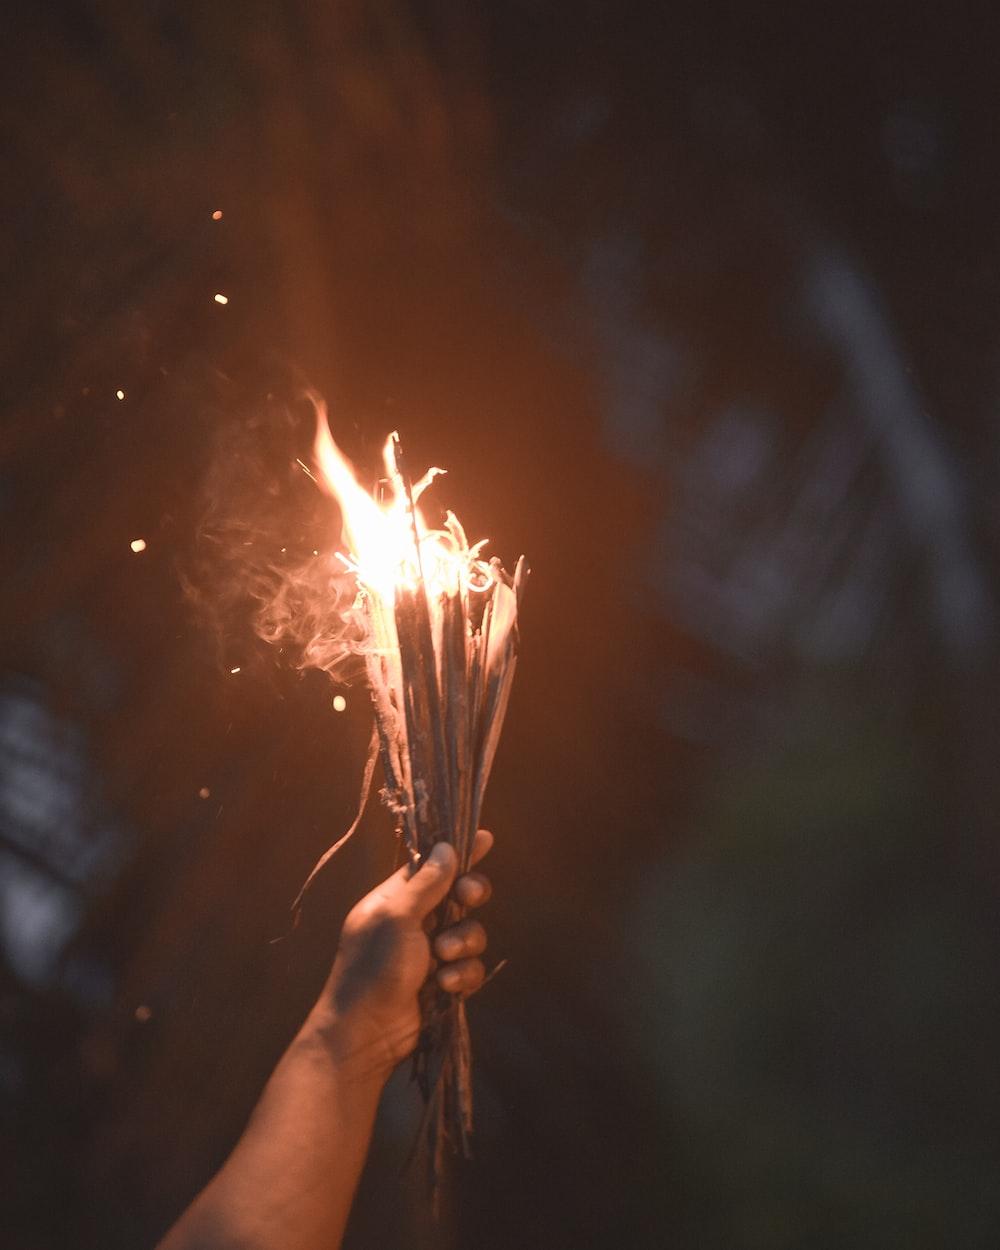 person holding burning sticks